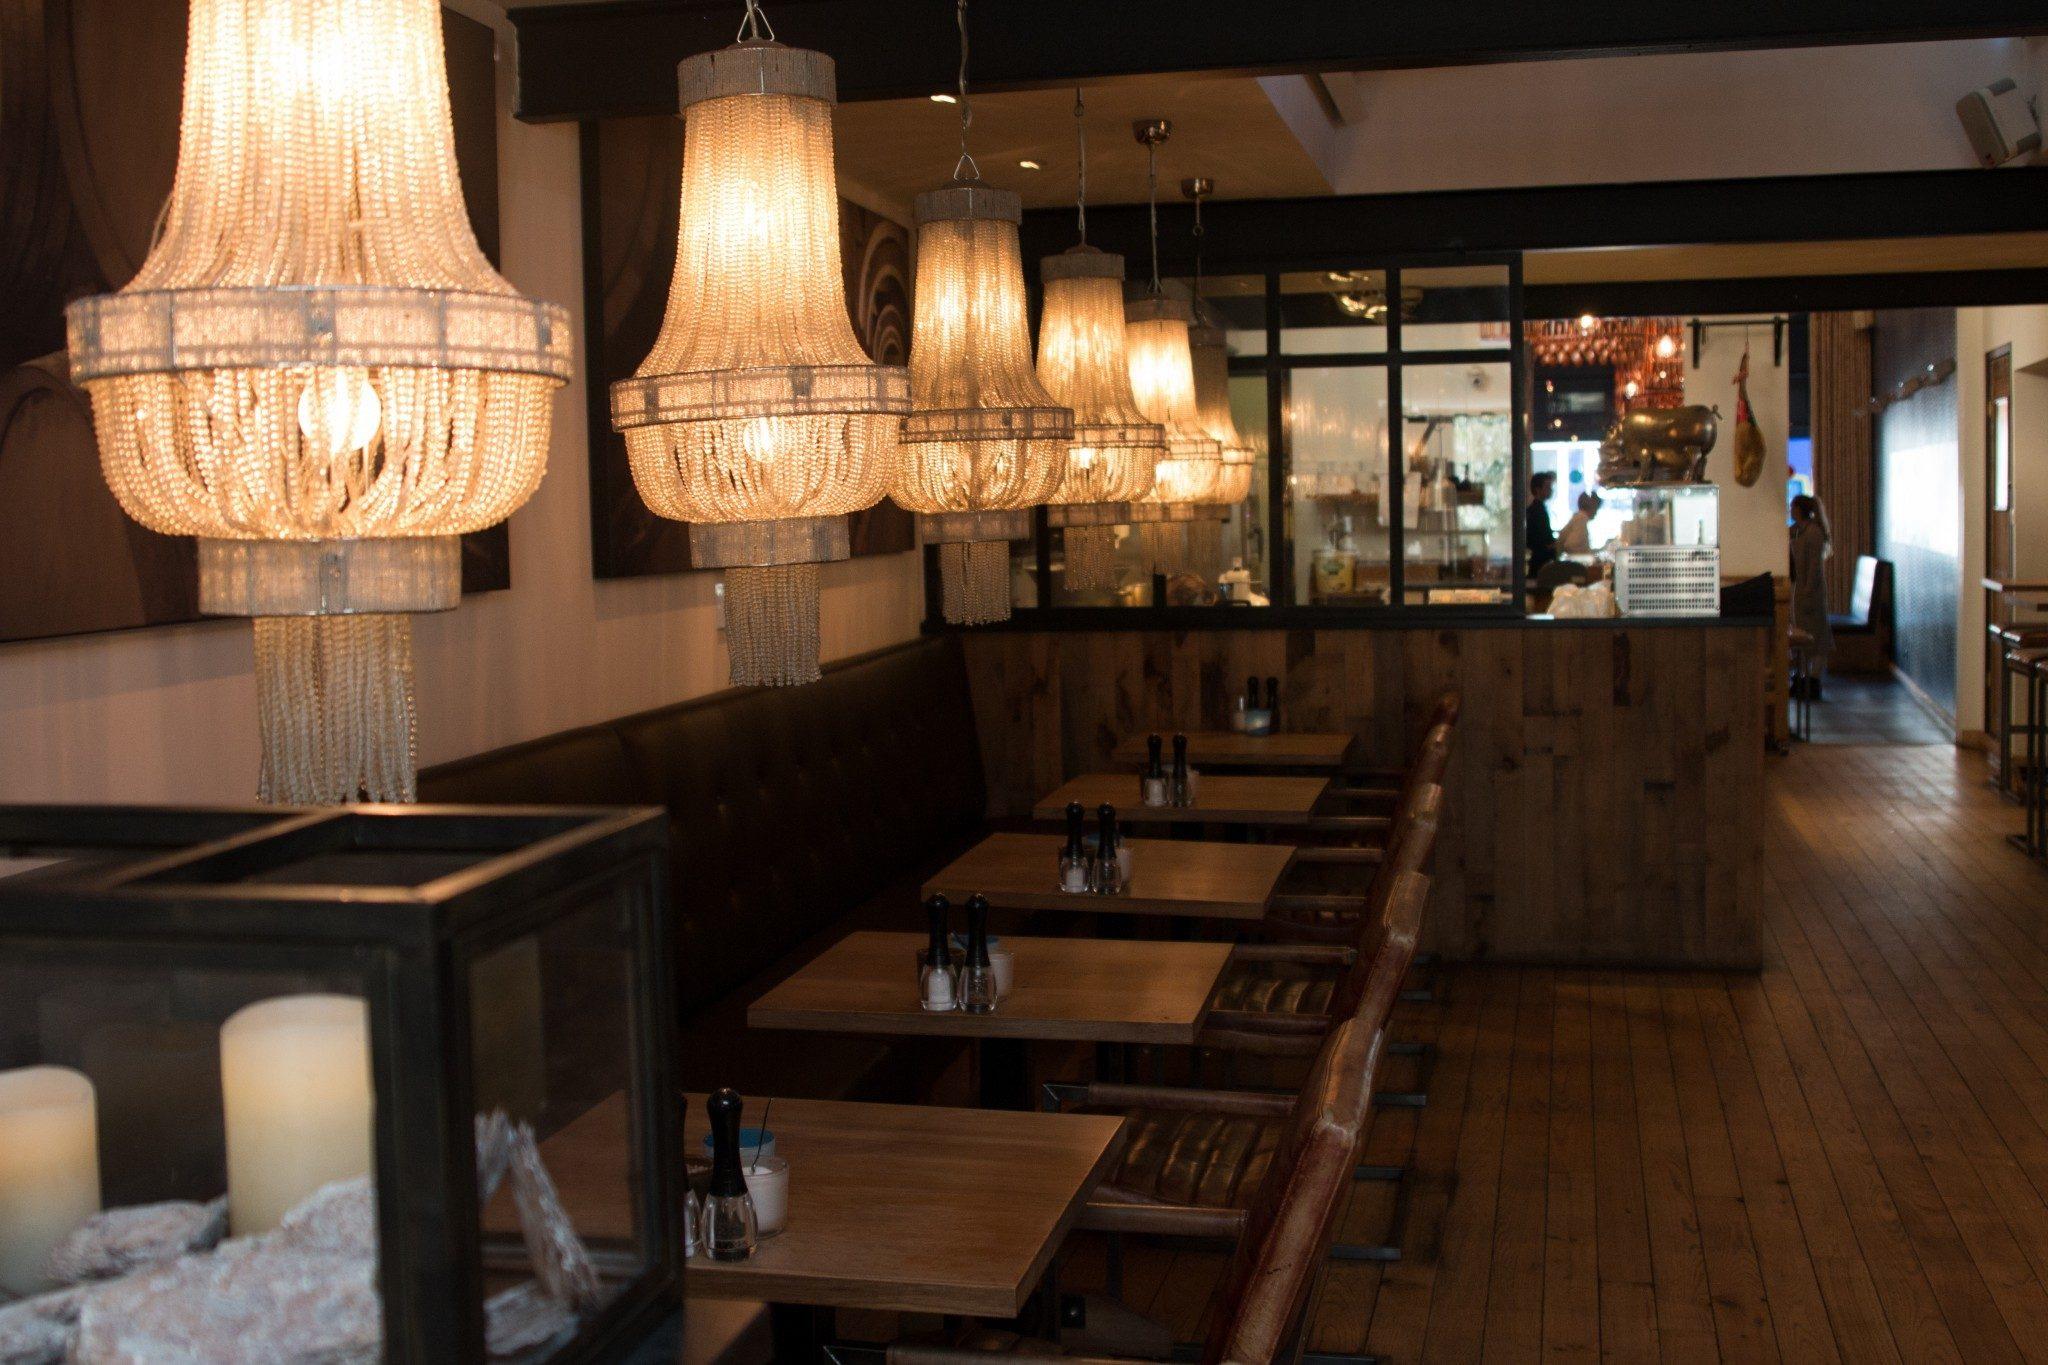 Interieur Restaurant Hemels Breda 3